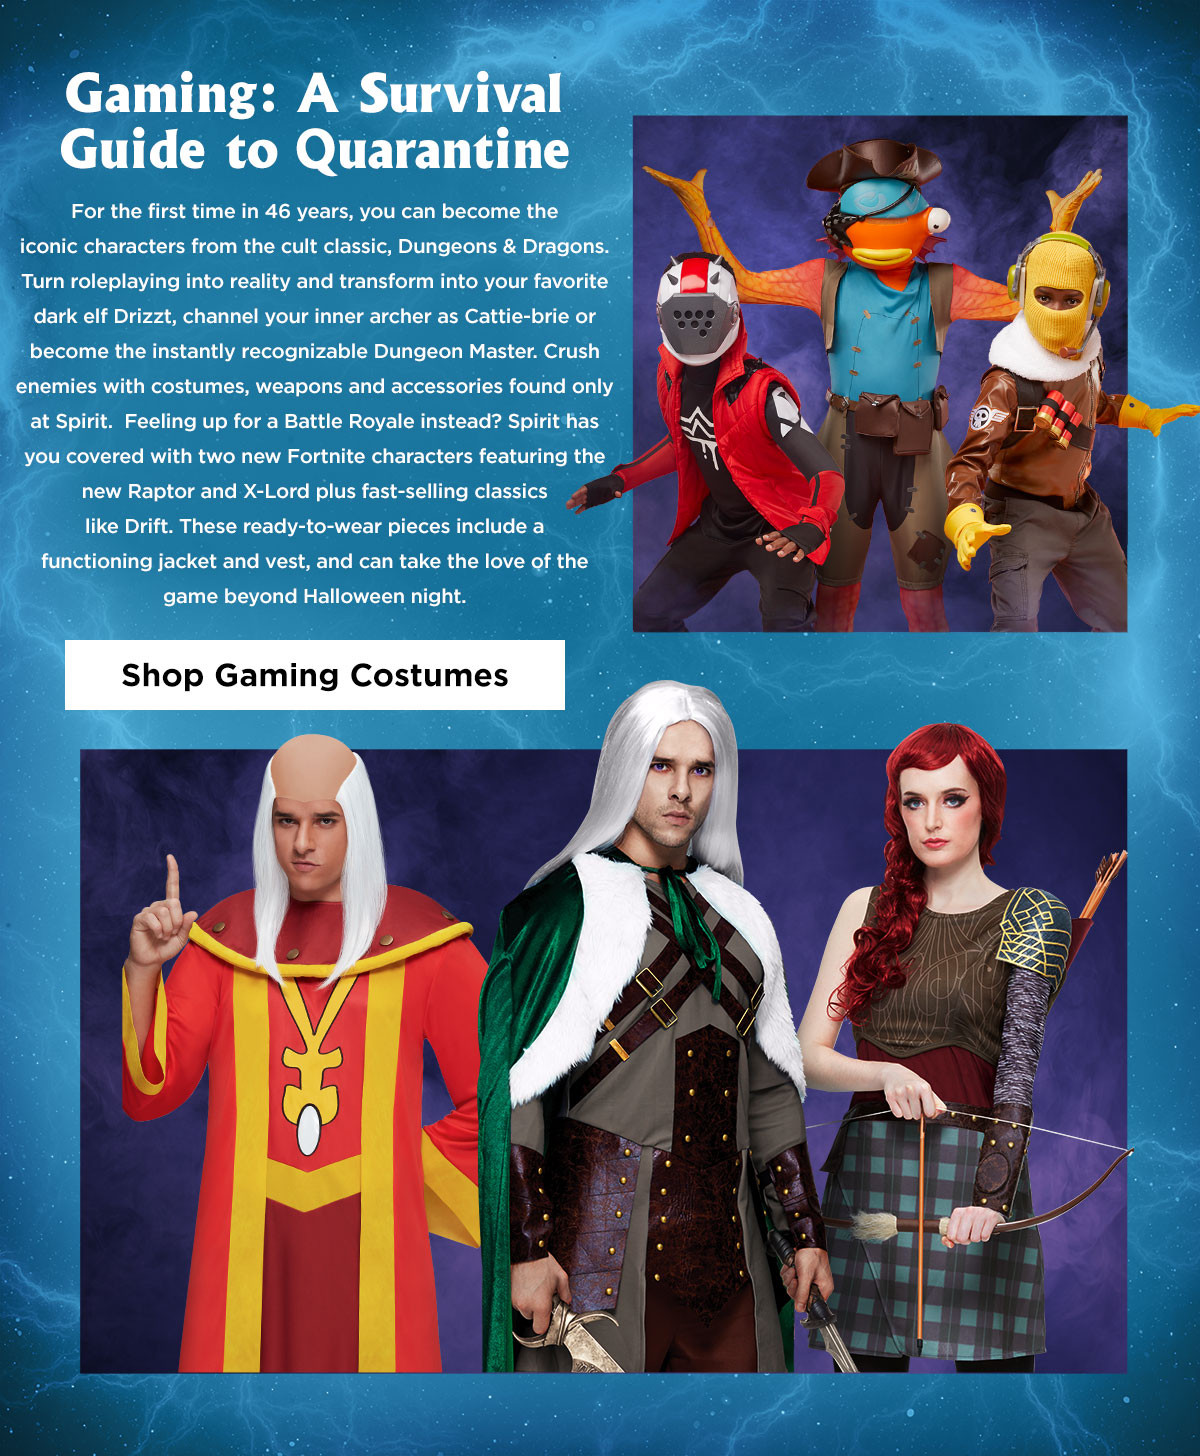 Gaming Costumes